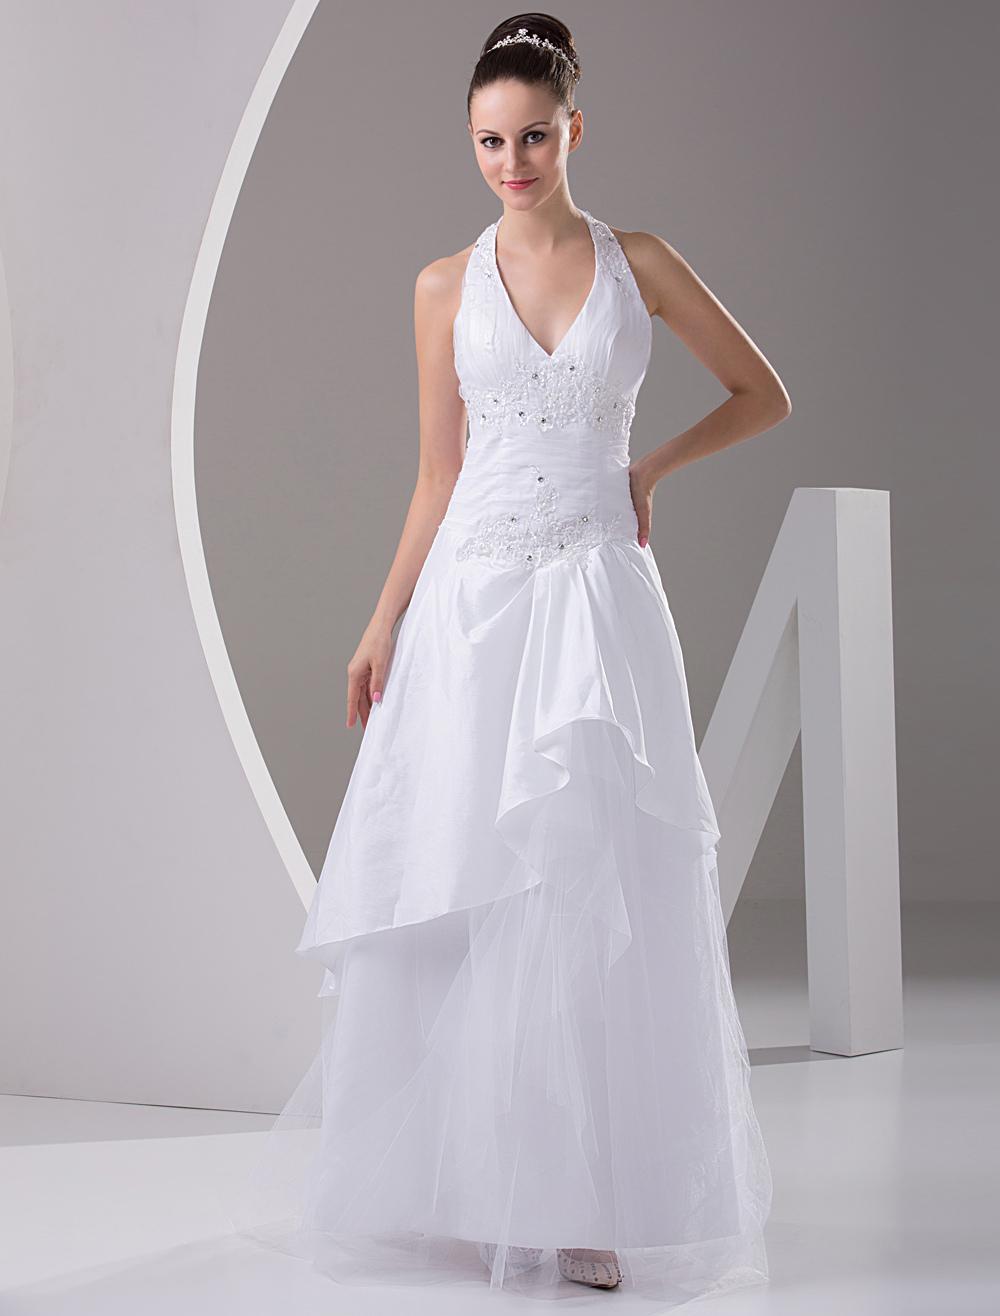 White A-line Halter V-Neck Taffeta Organza Wedding Gown (Cheap Wedding Dress) photo